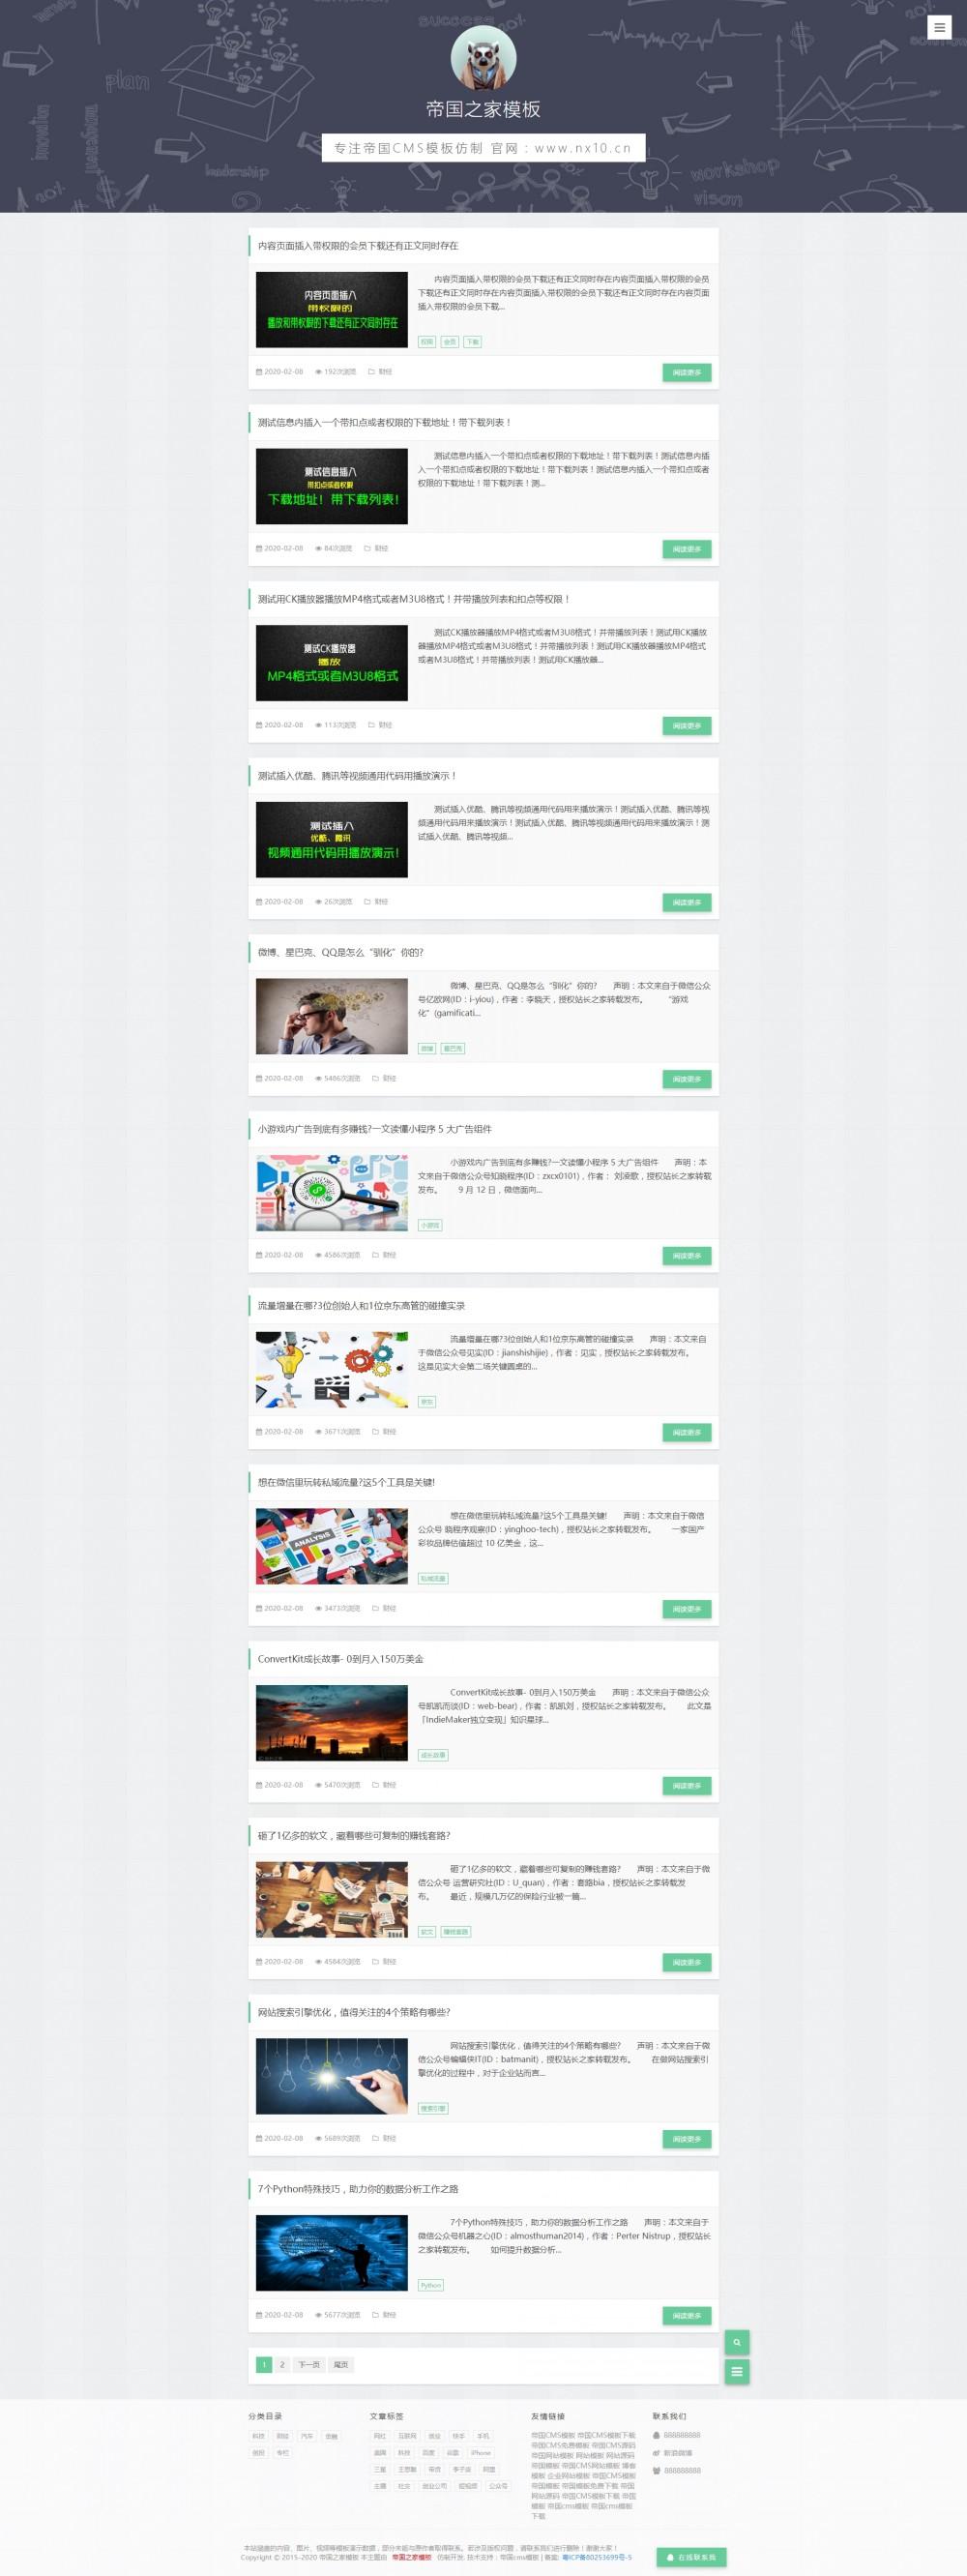 [DG-0241]响应式单栏个人博客帝国cms模板 HTML5自适应个人网站模板下载 博客文章 第2张